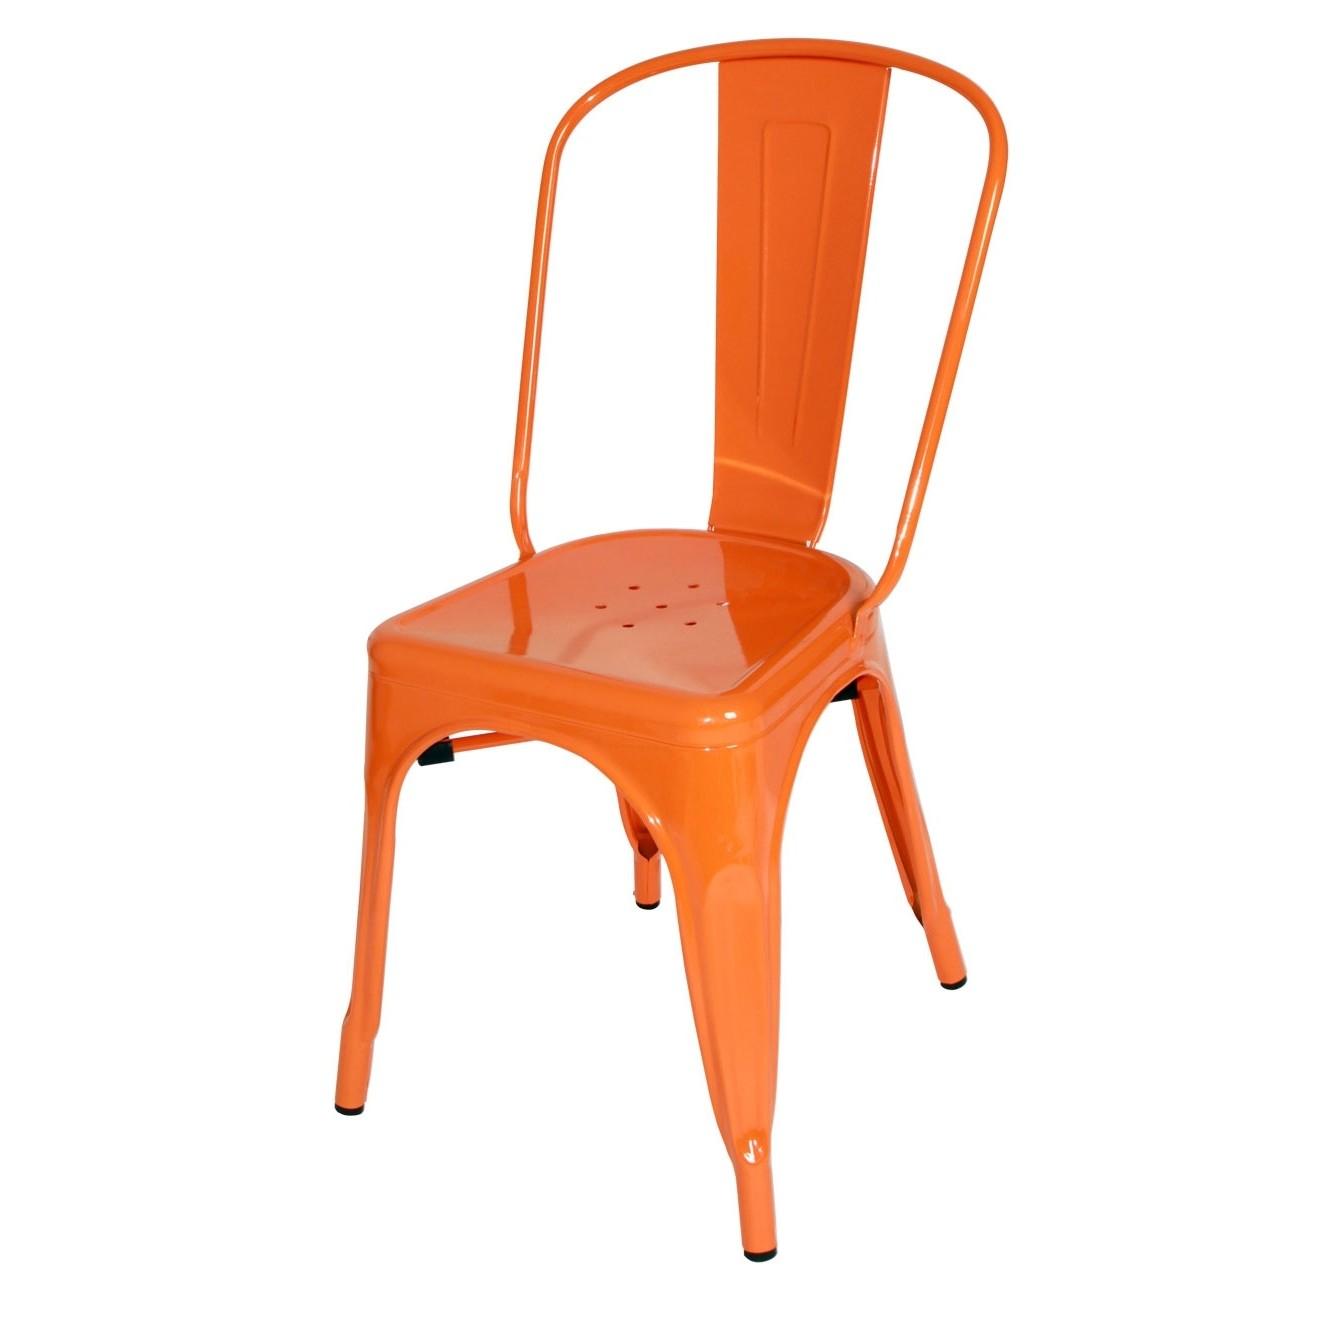 orange cafe chairs ergonomic chair levers tolix style metal industrial loft designer